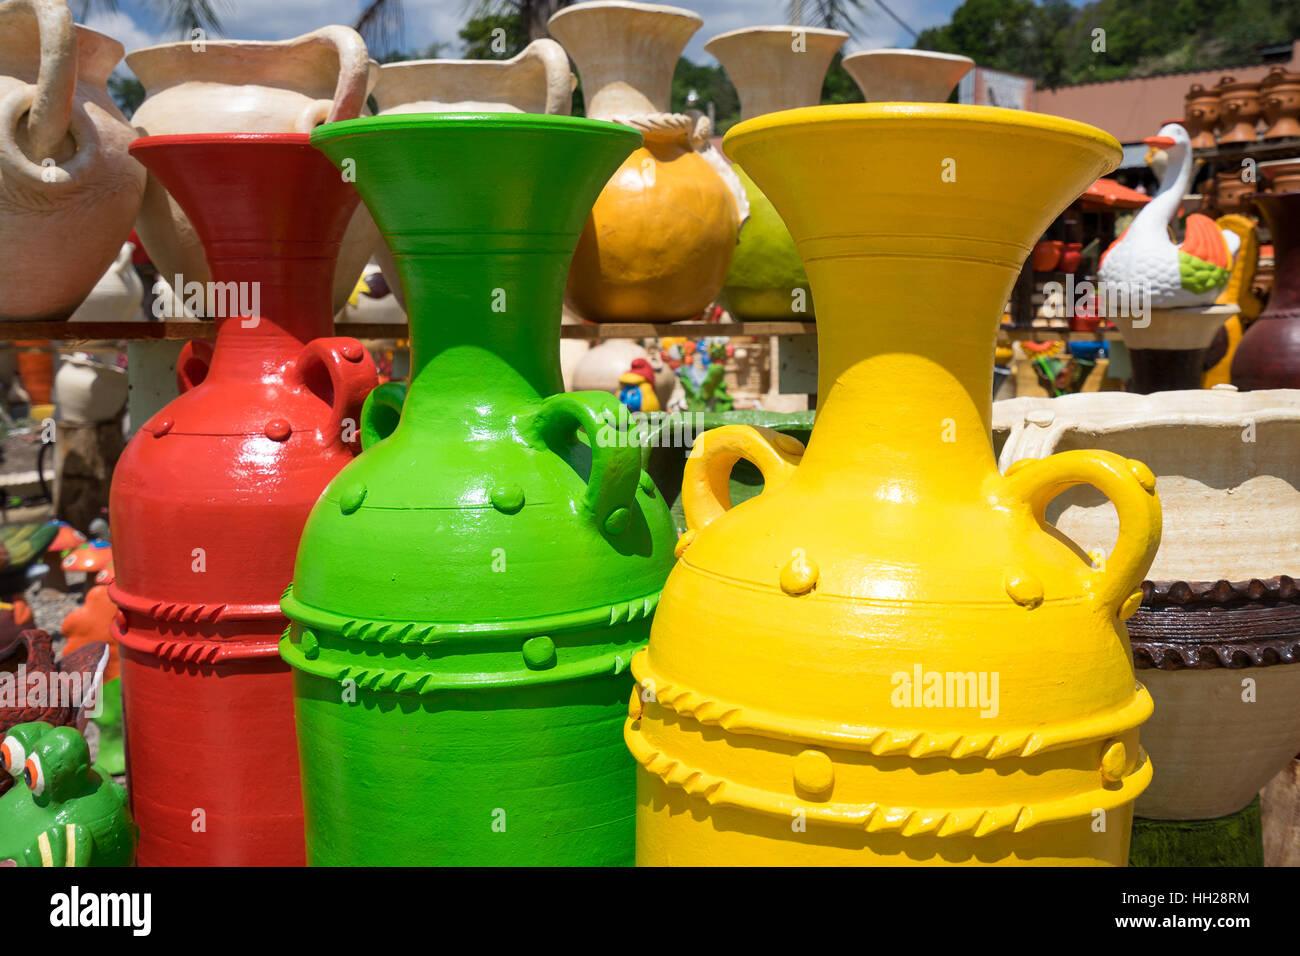 May 16, 2016 Honduras: closeup vases at roadside pottery vendor - Stock Image